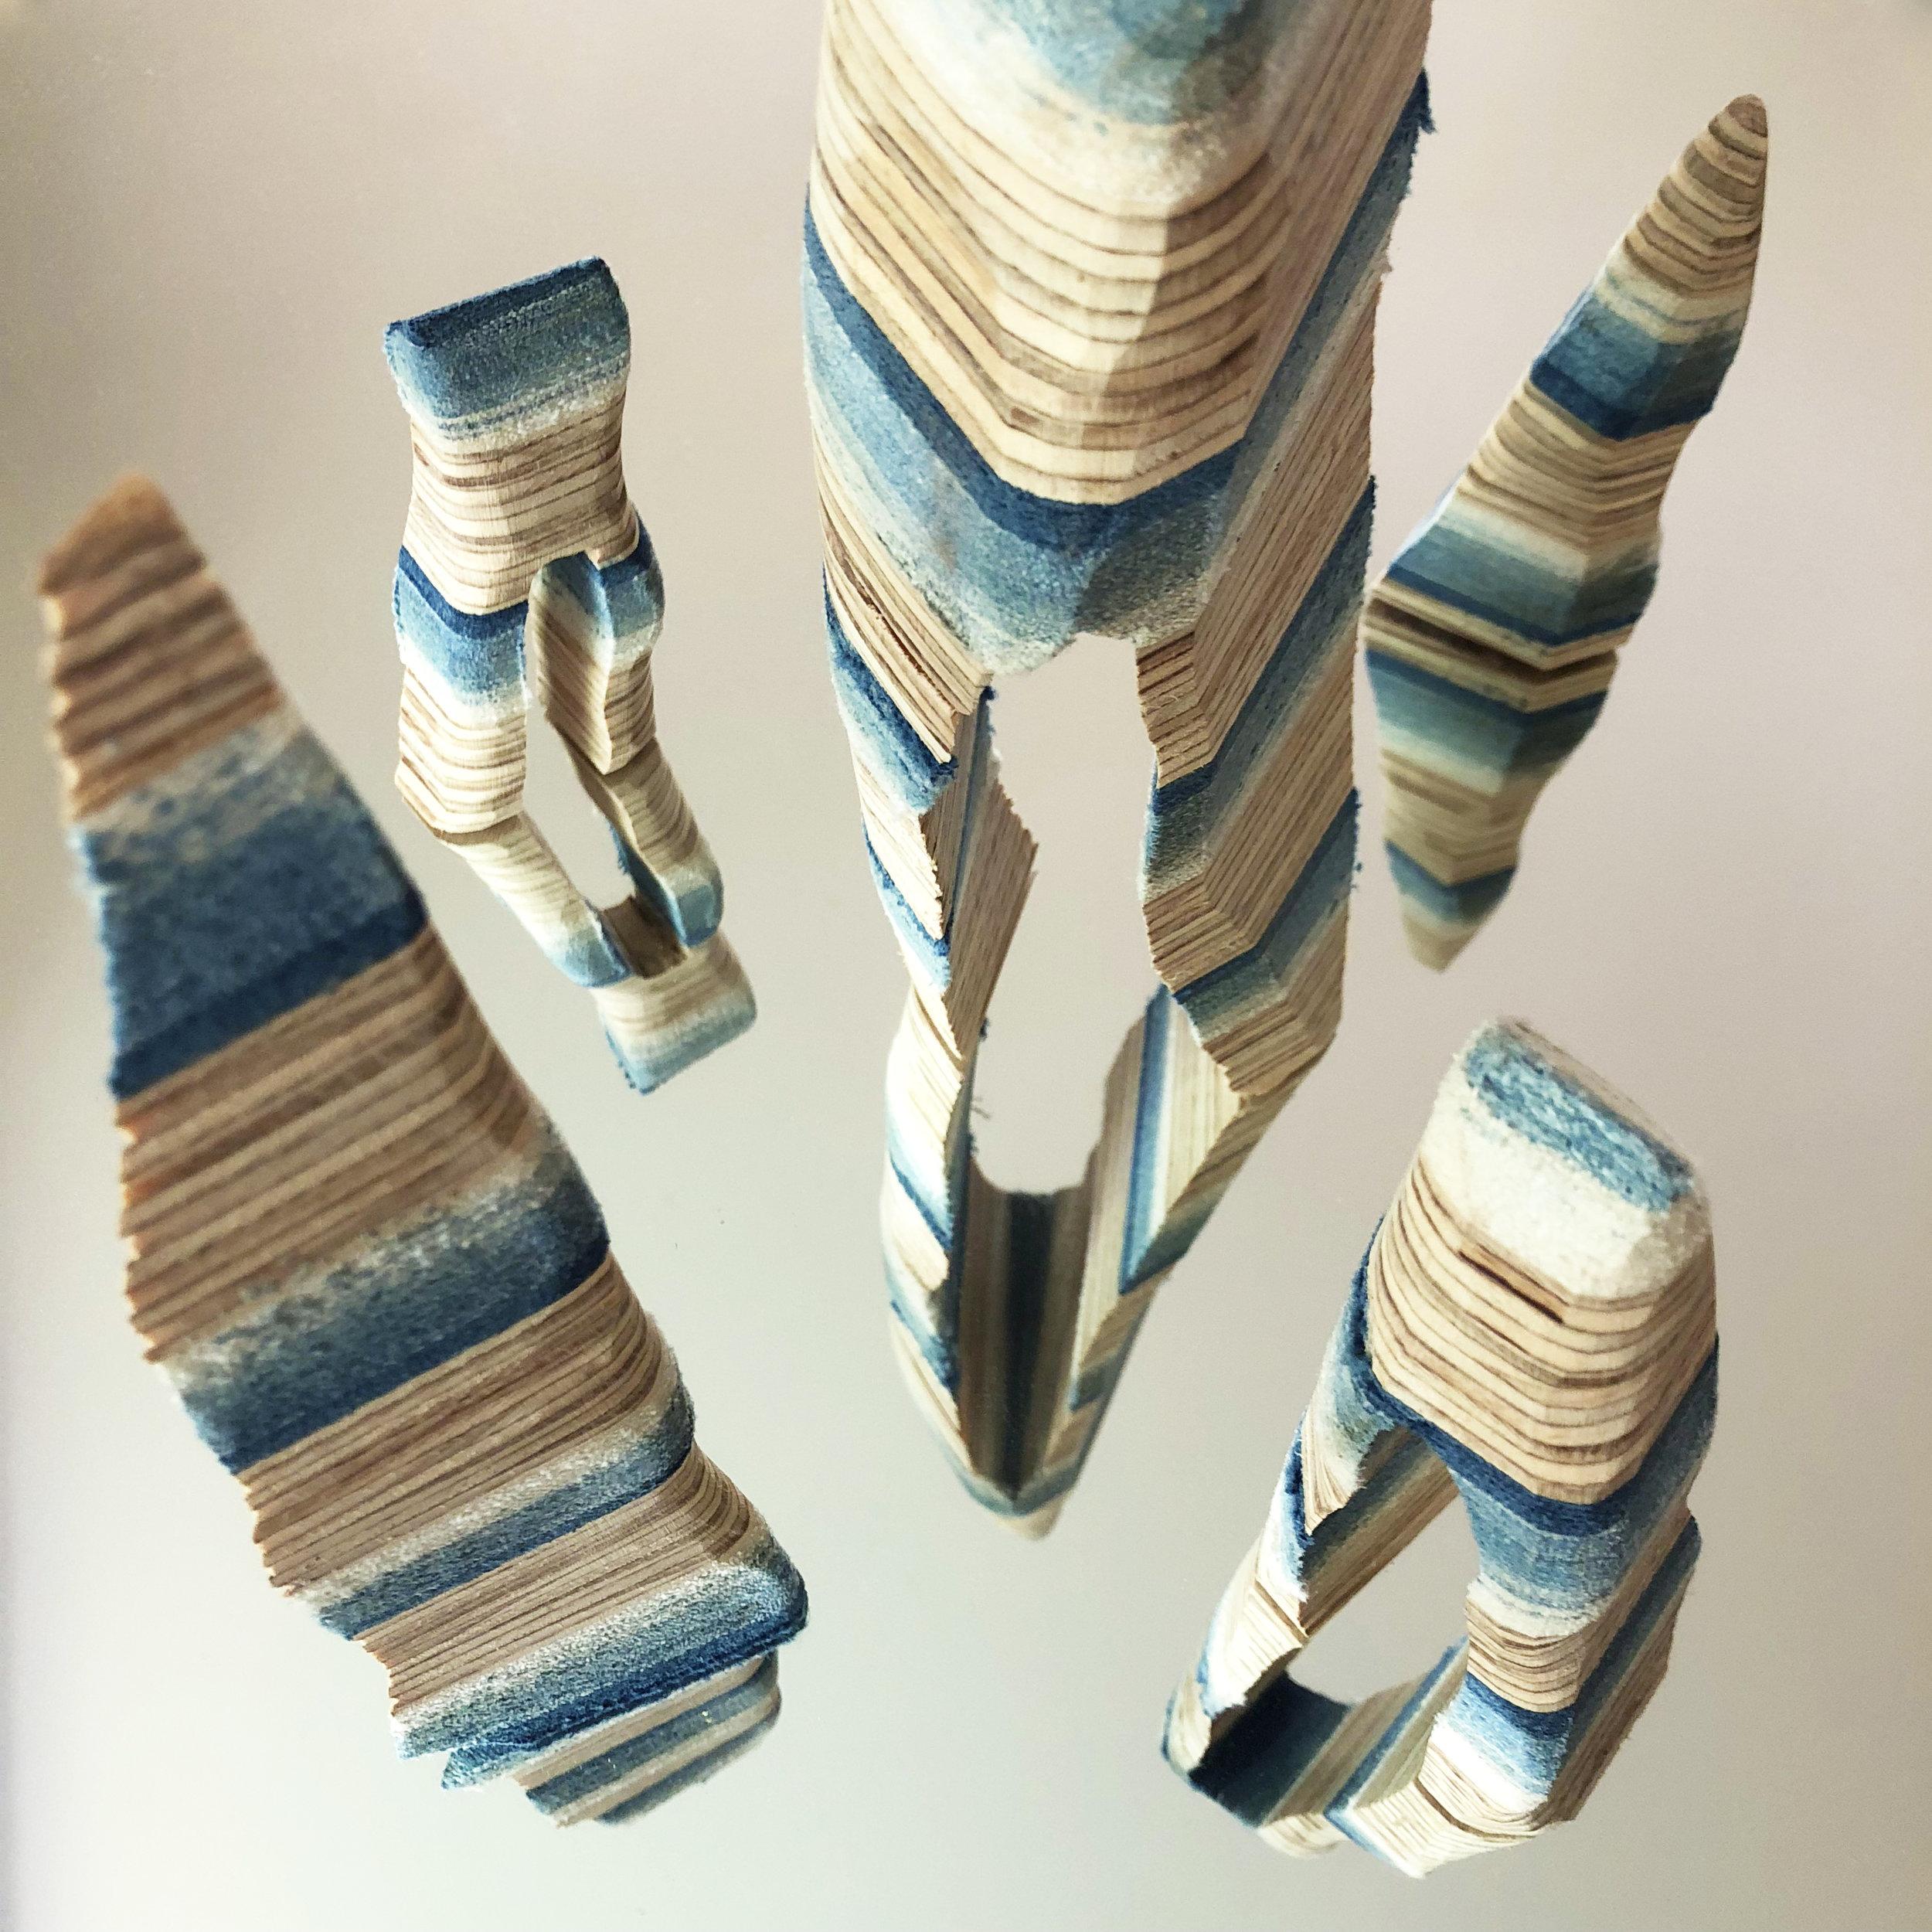 Rachael Wellisch,  Monuments reflected, 2018.  Indigo dyed salvaged textiles layered with studio scraps of plywood. Image: Rachael Wellisch.